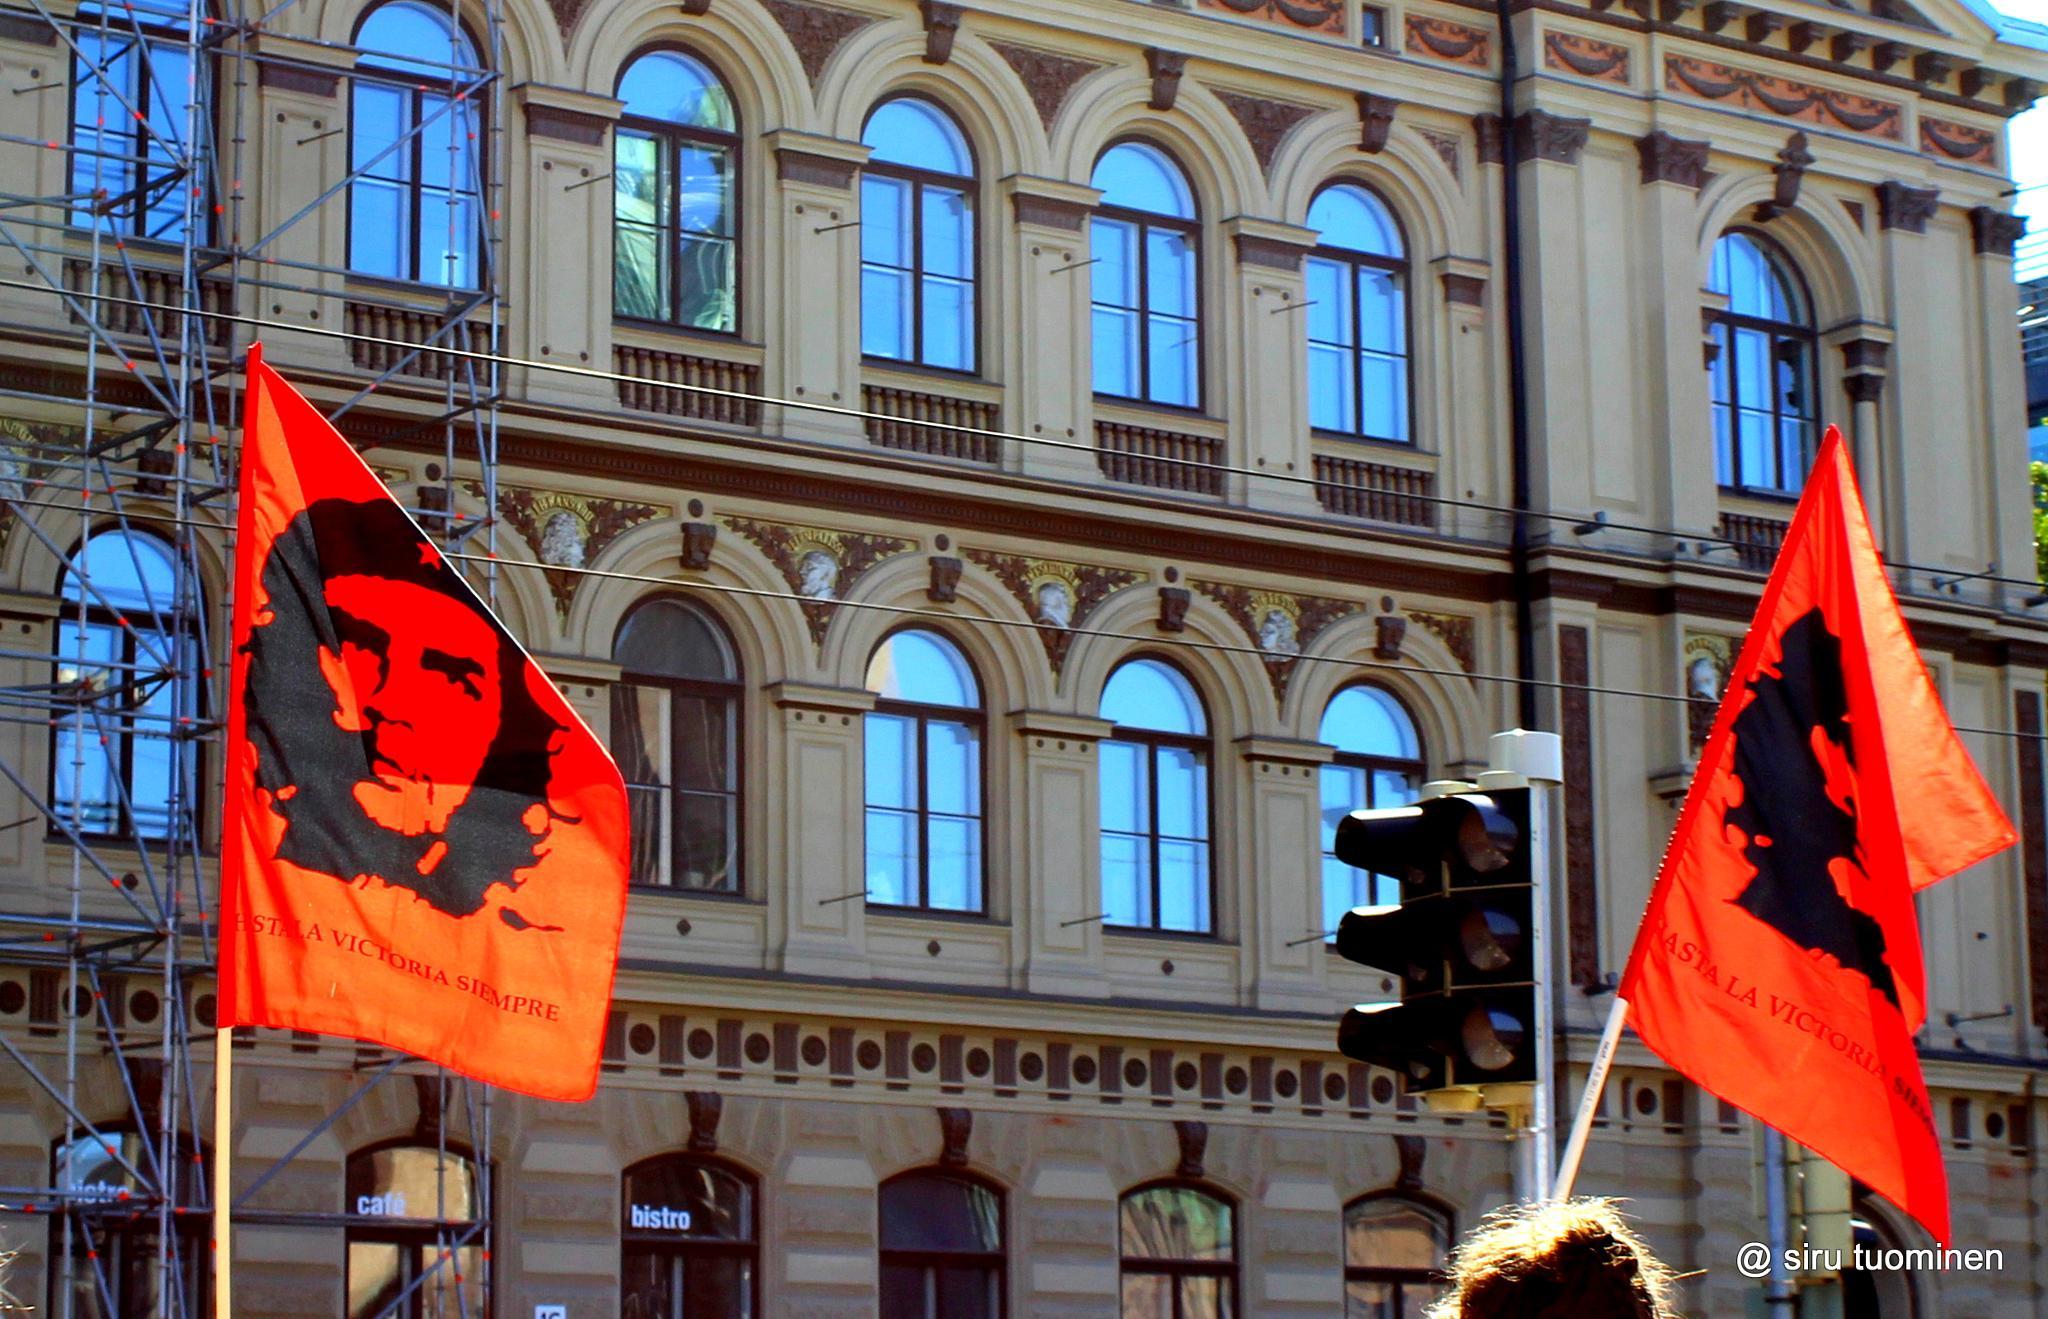 a demonstration today in Helsinki by siru tuominen